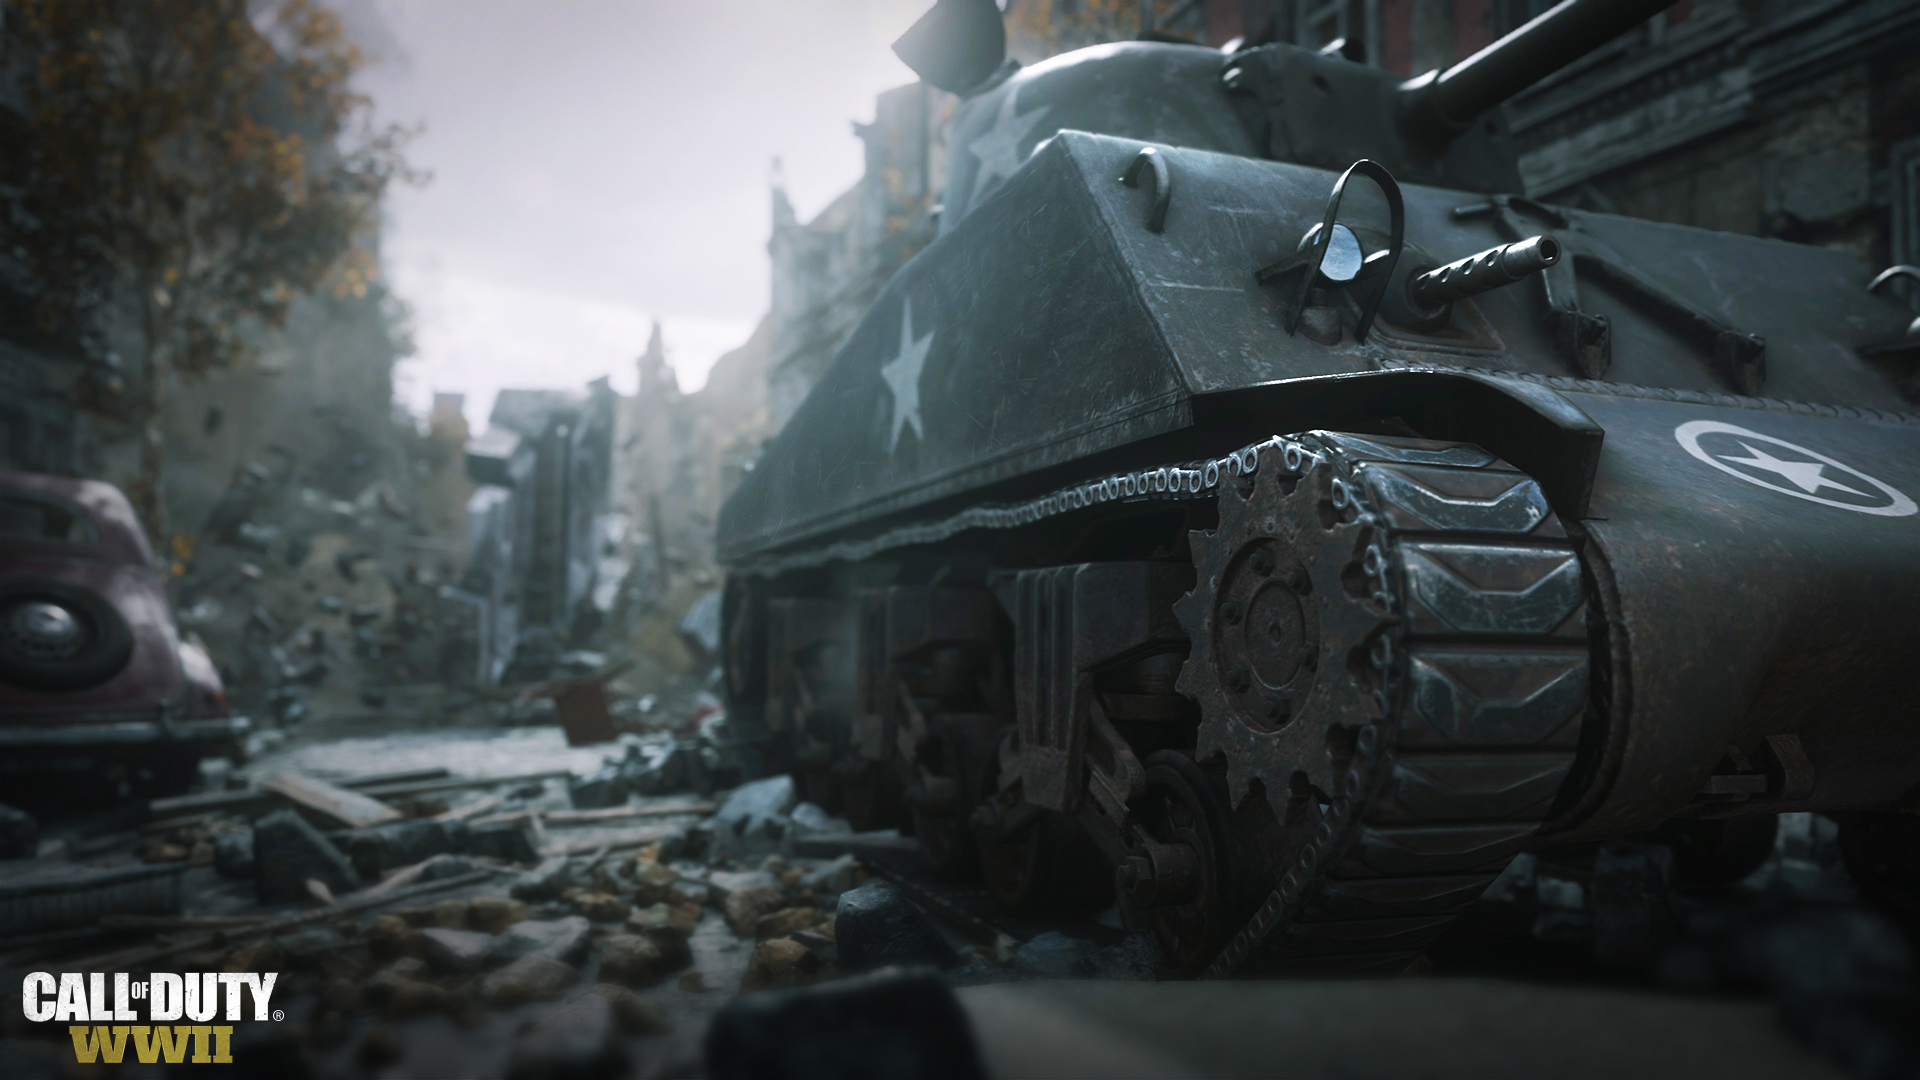 CallofDuty_WWII_Screen4.JPG